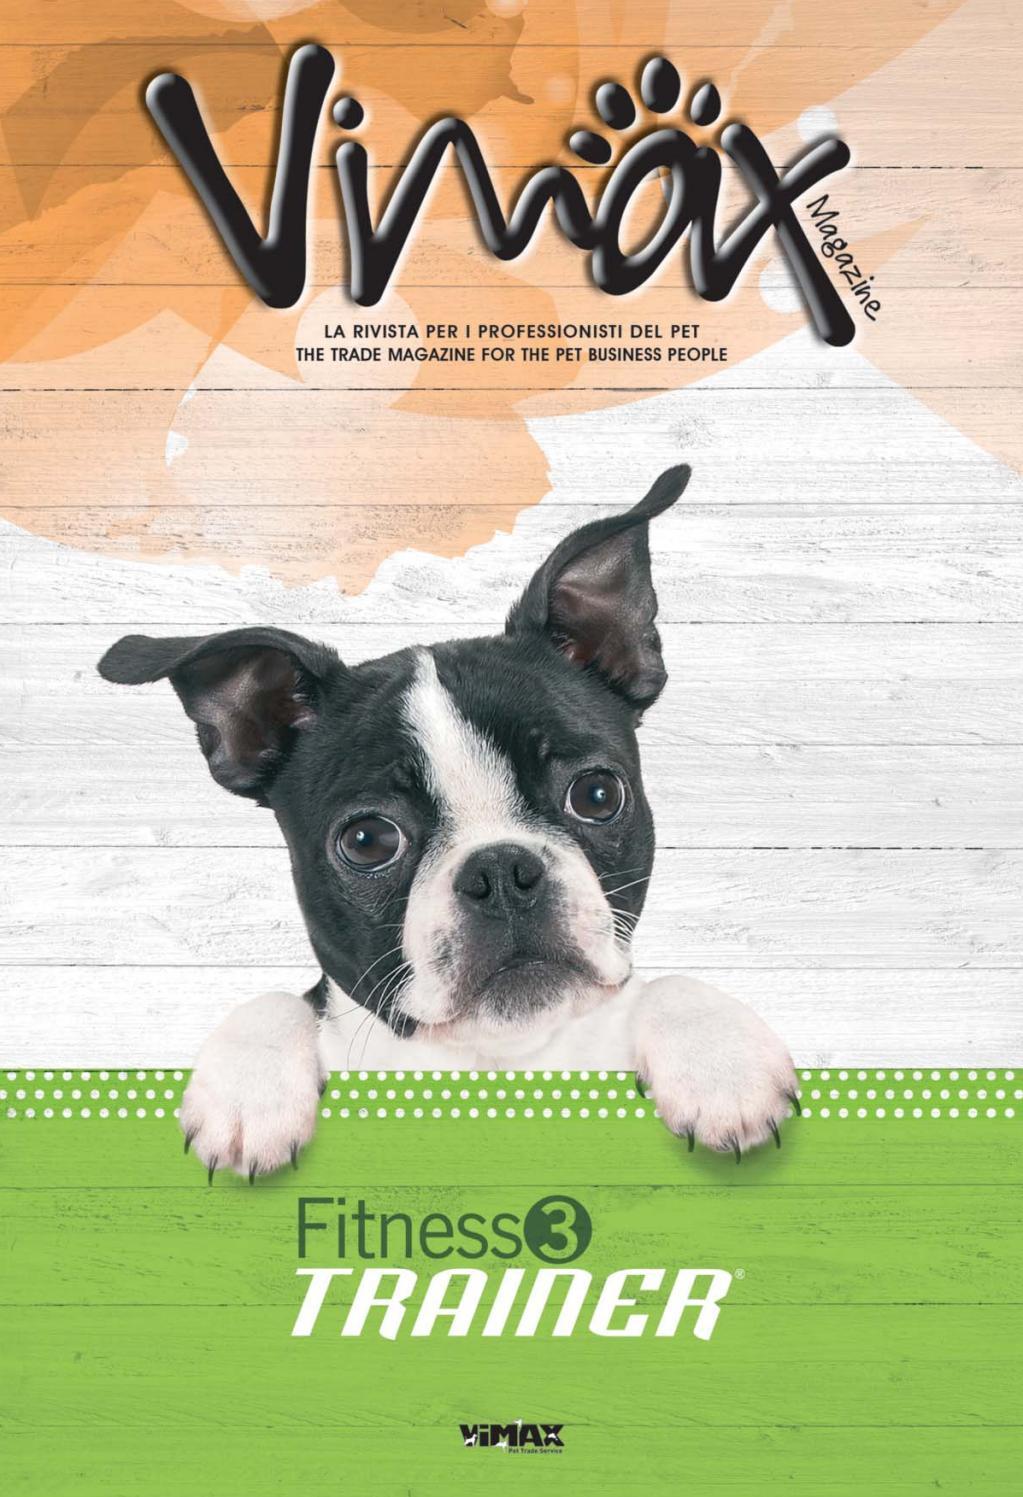 Modena Dog Calendario 2020.Settembre September 2016 By Vimax Srl Issuu